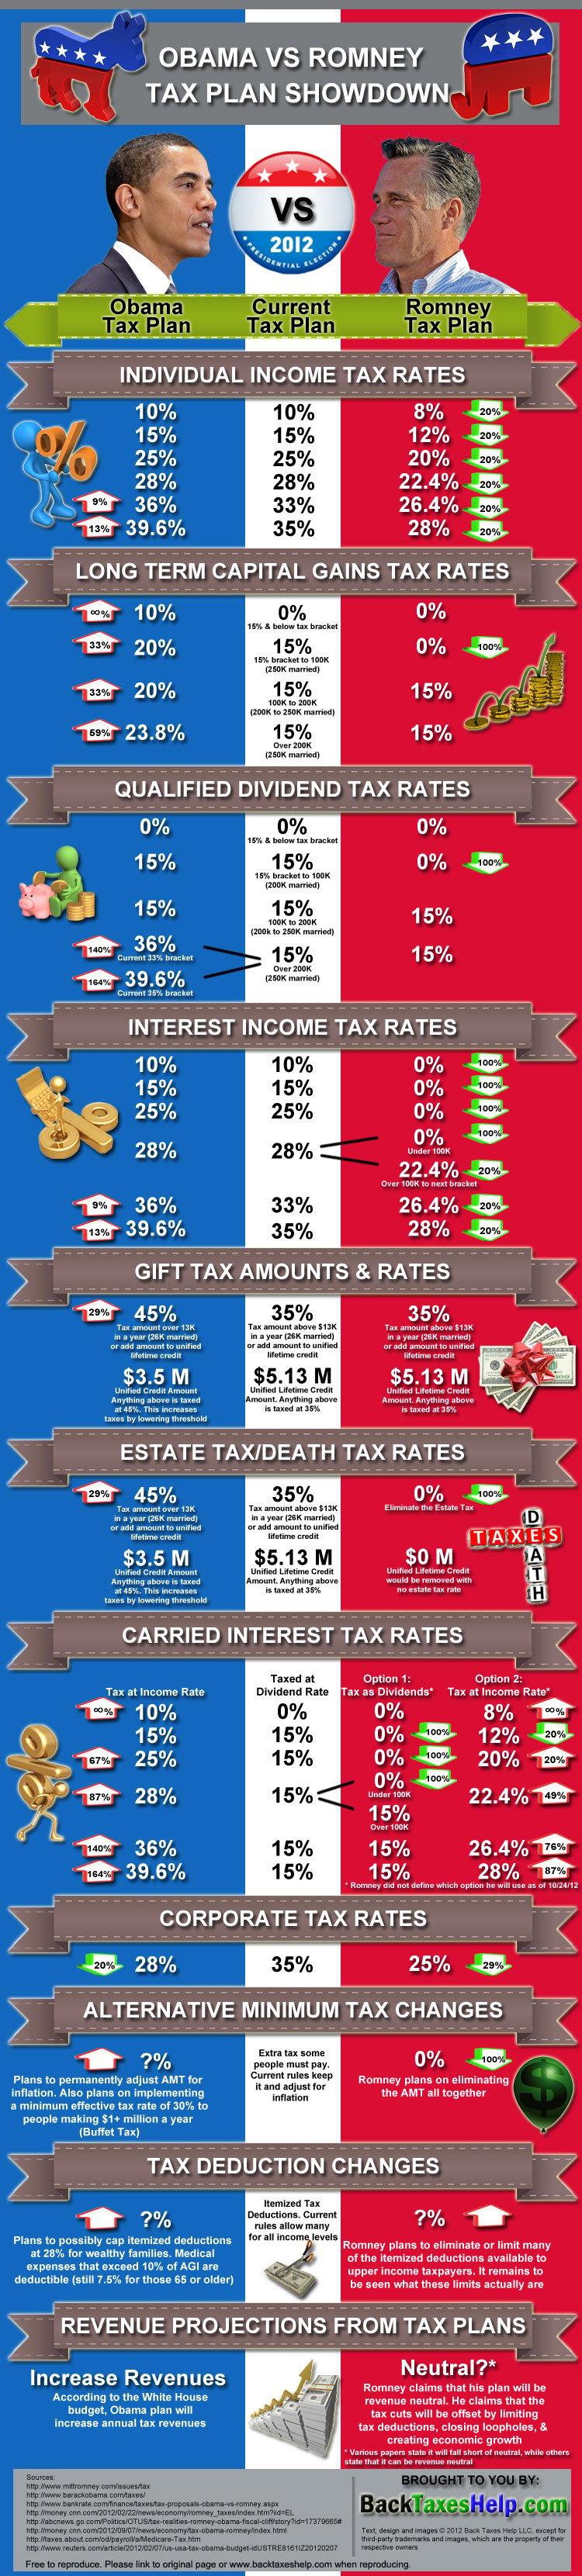 Obama vs. Romney Tax Plan Showdown